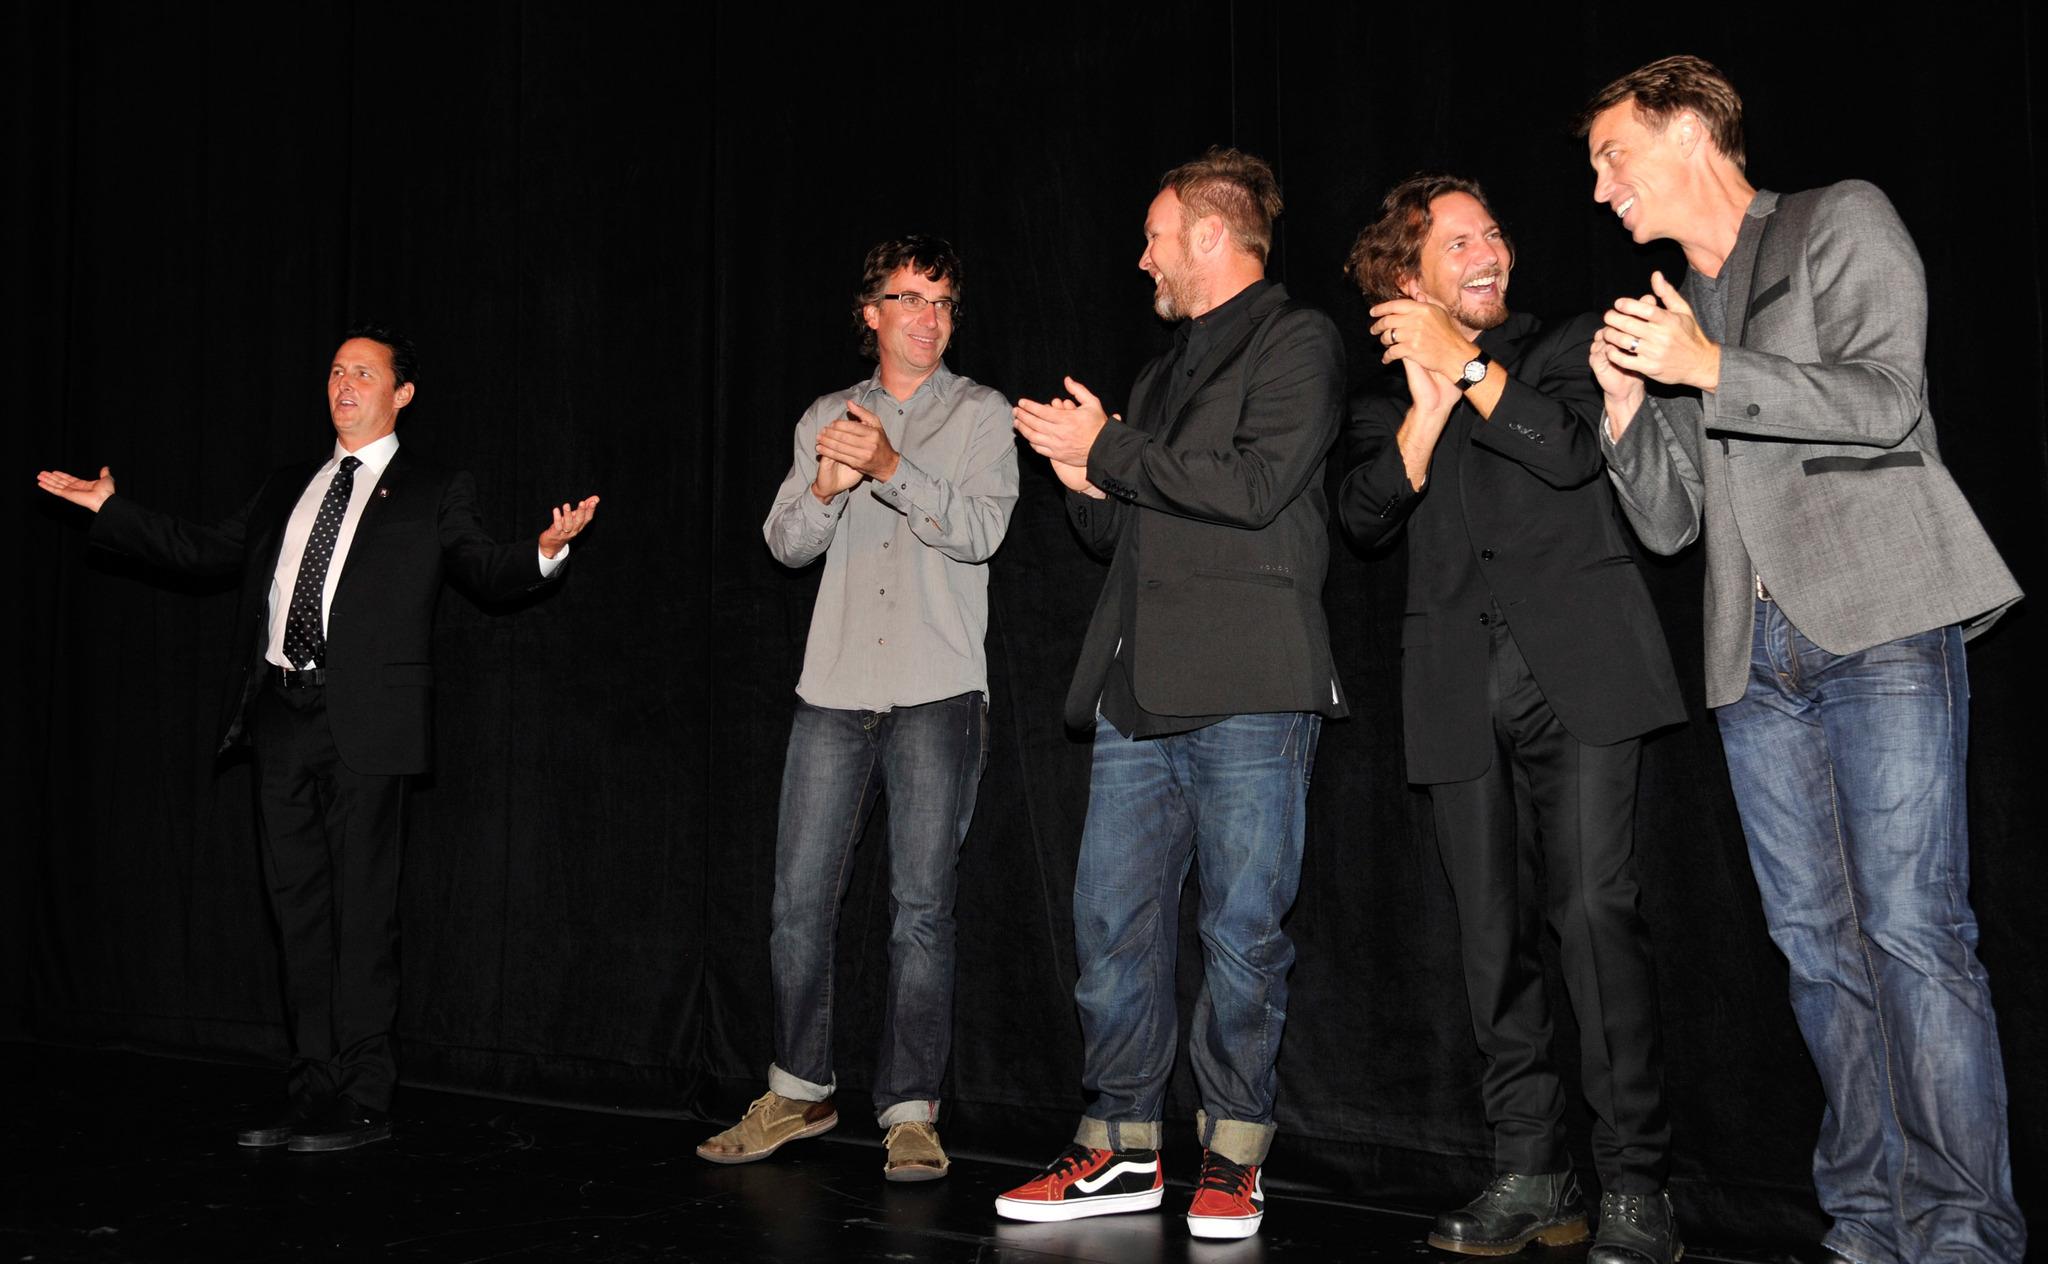 Jeff Ament, Matt Cameron, Stone Gossard, Mike McCready, Eddie Vedder and Pearl Jam at event of Pearl Jam Twenty (2011)